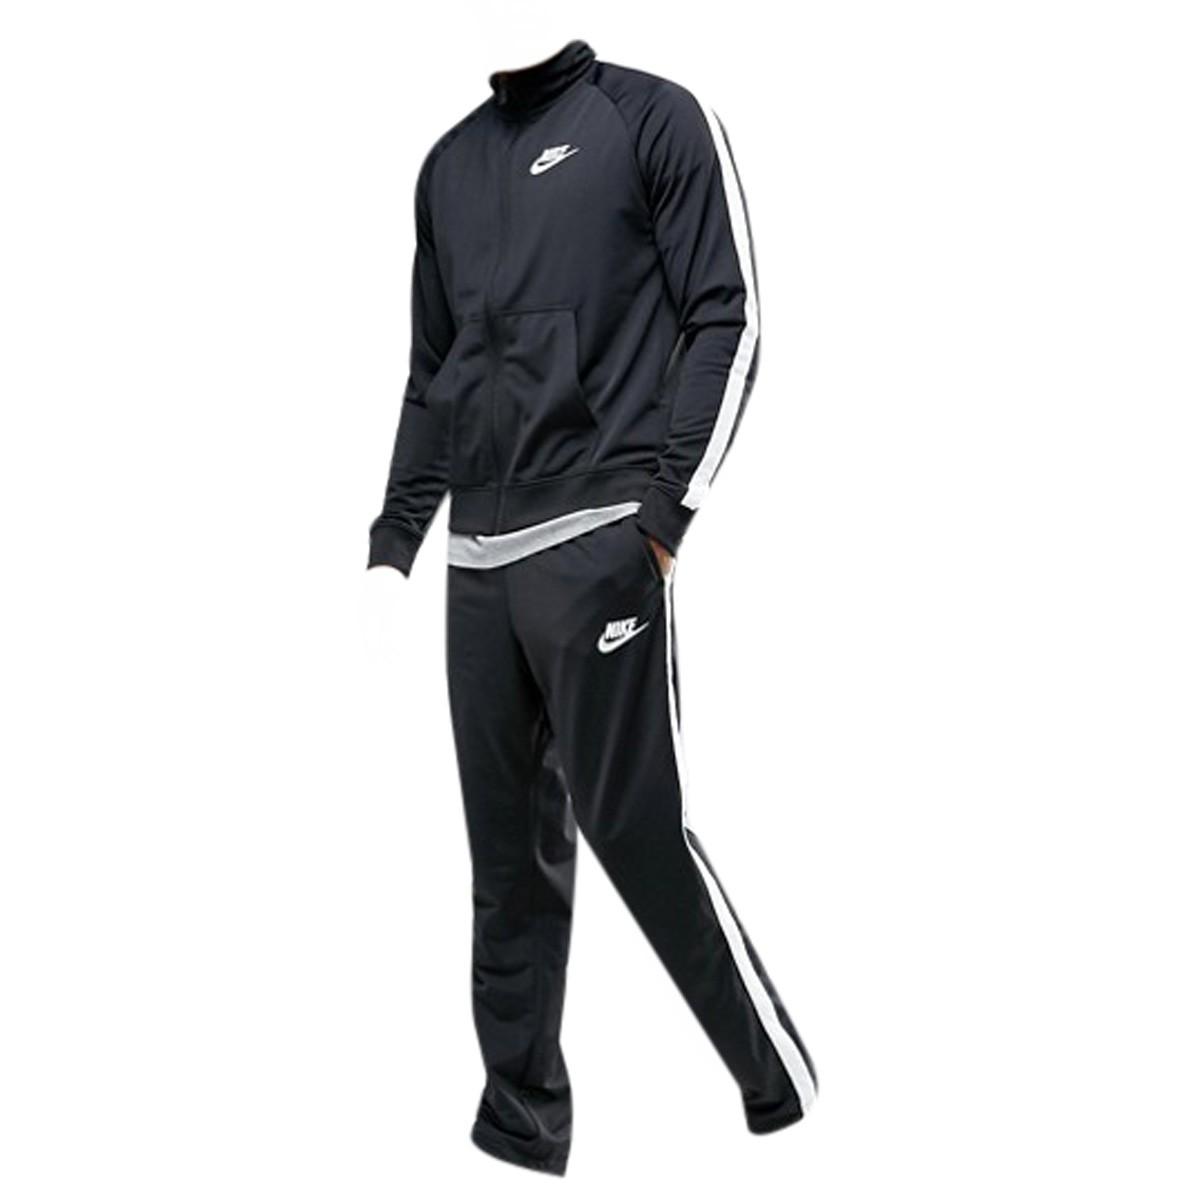 Agasalho Masculino Nike Tracksuit 840643-010 Preto Branco 4968f87515311